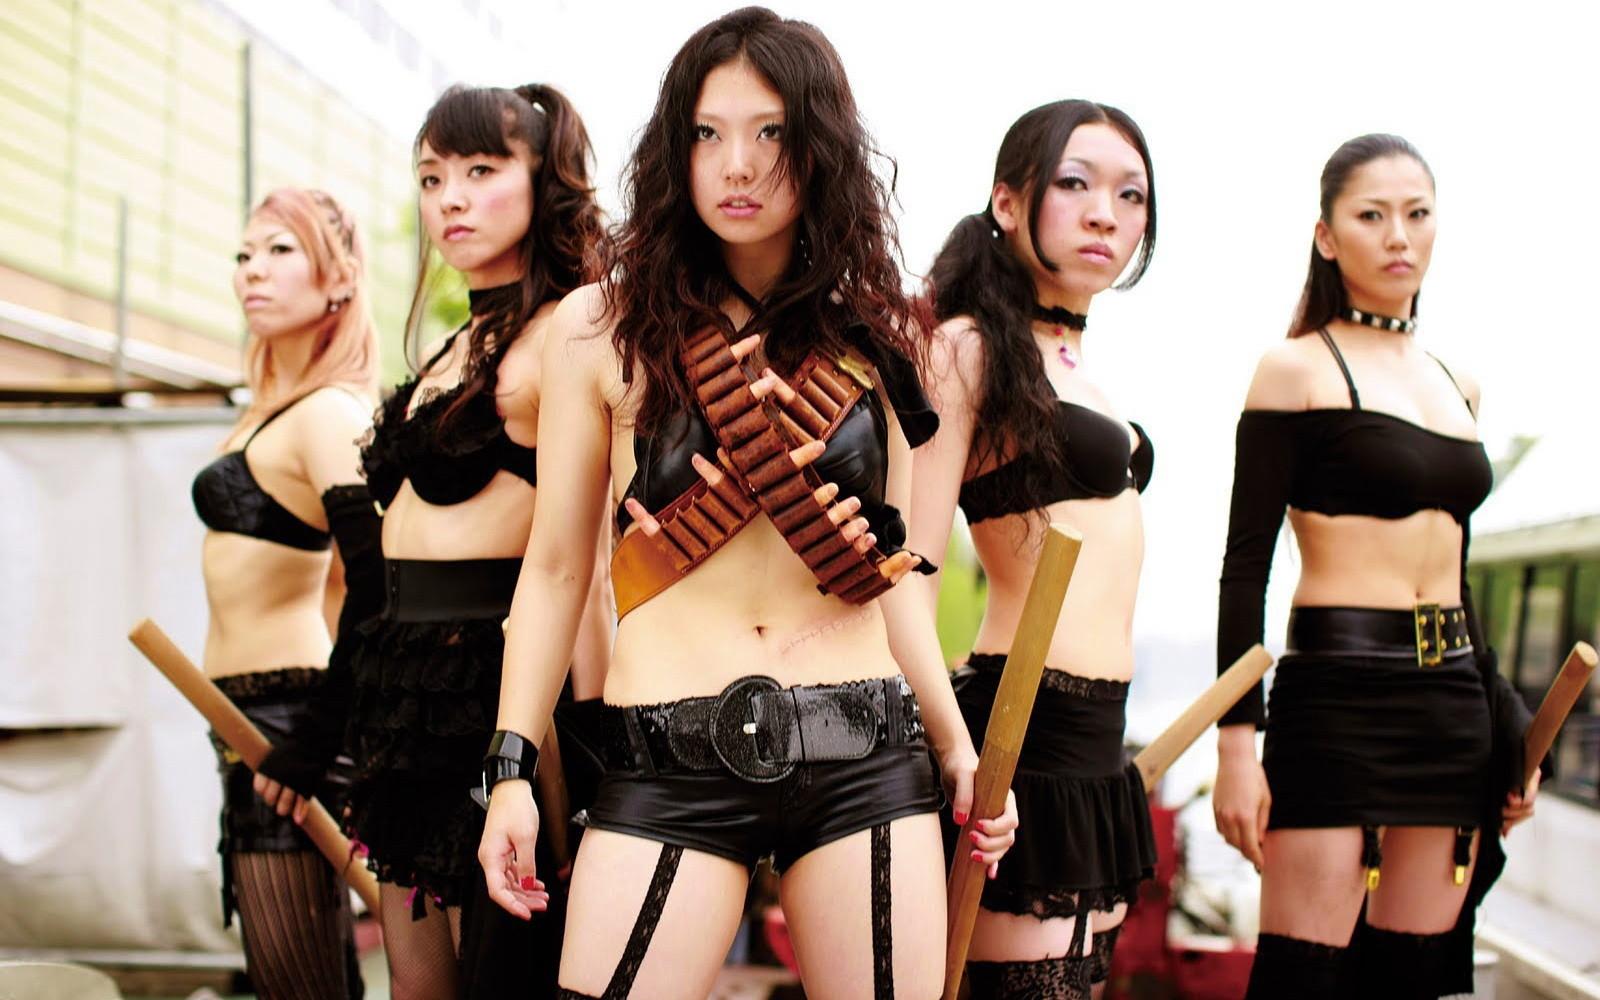 mukherjee-squirting-free-japanese-girls-gp-movies-nide-girls